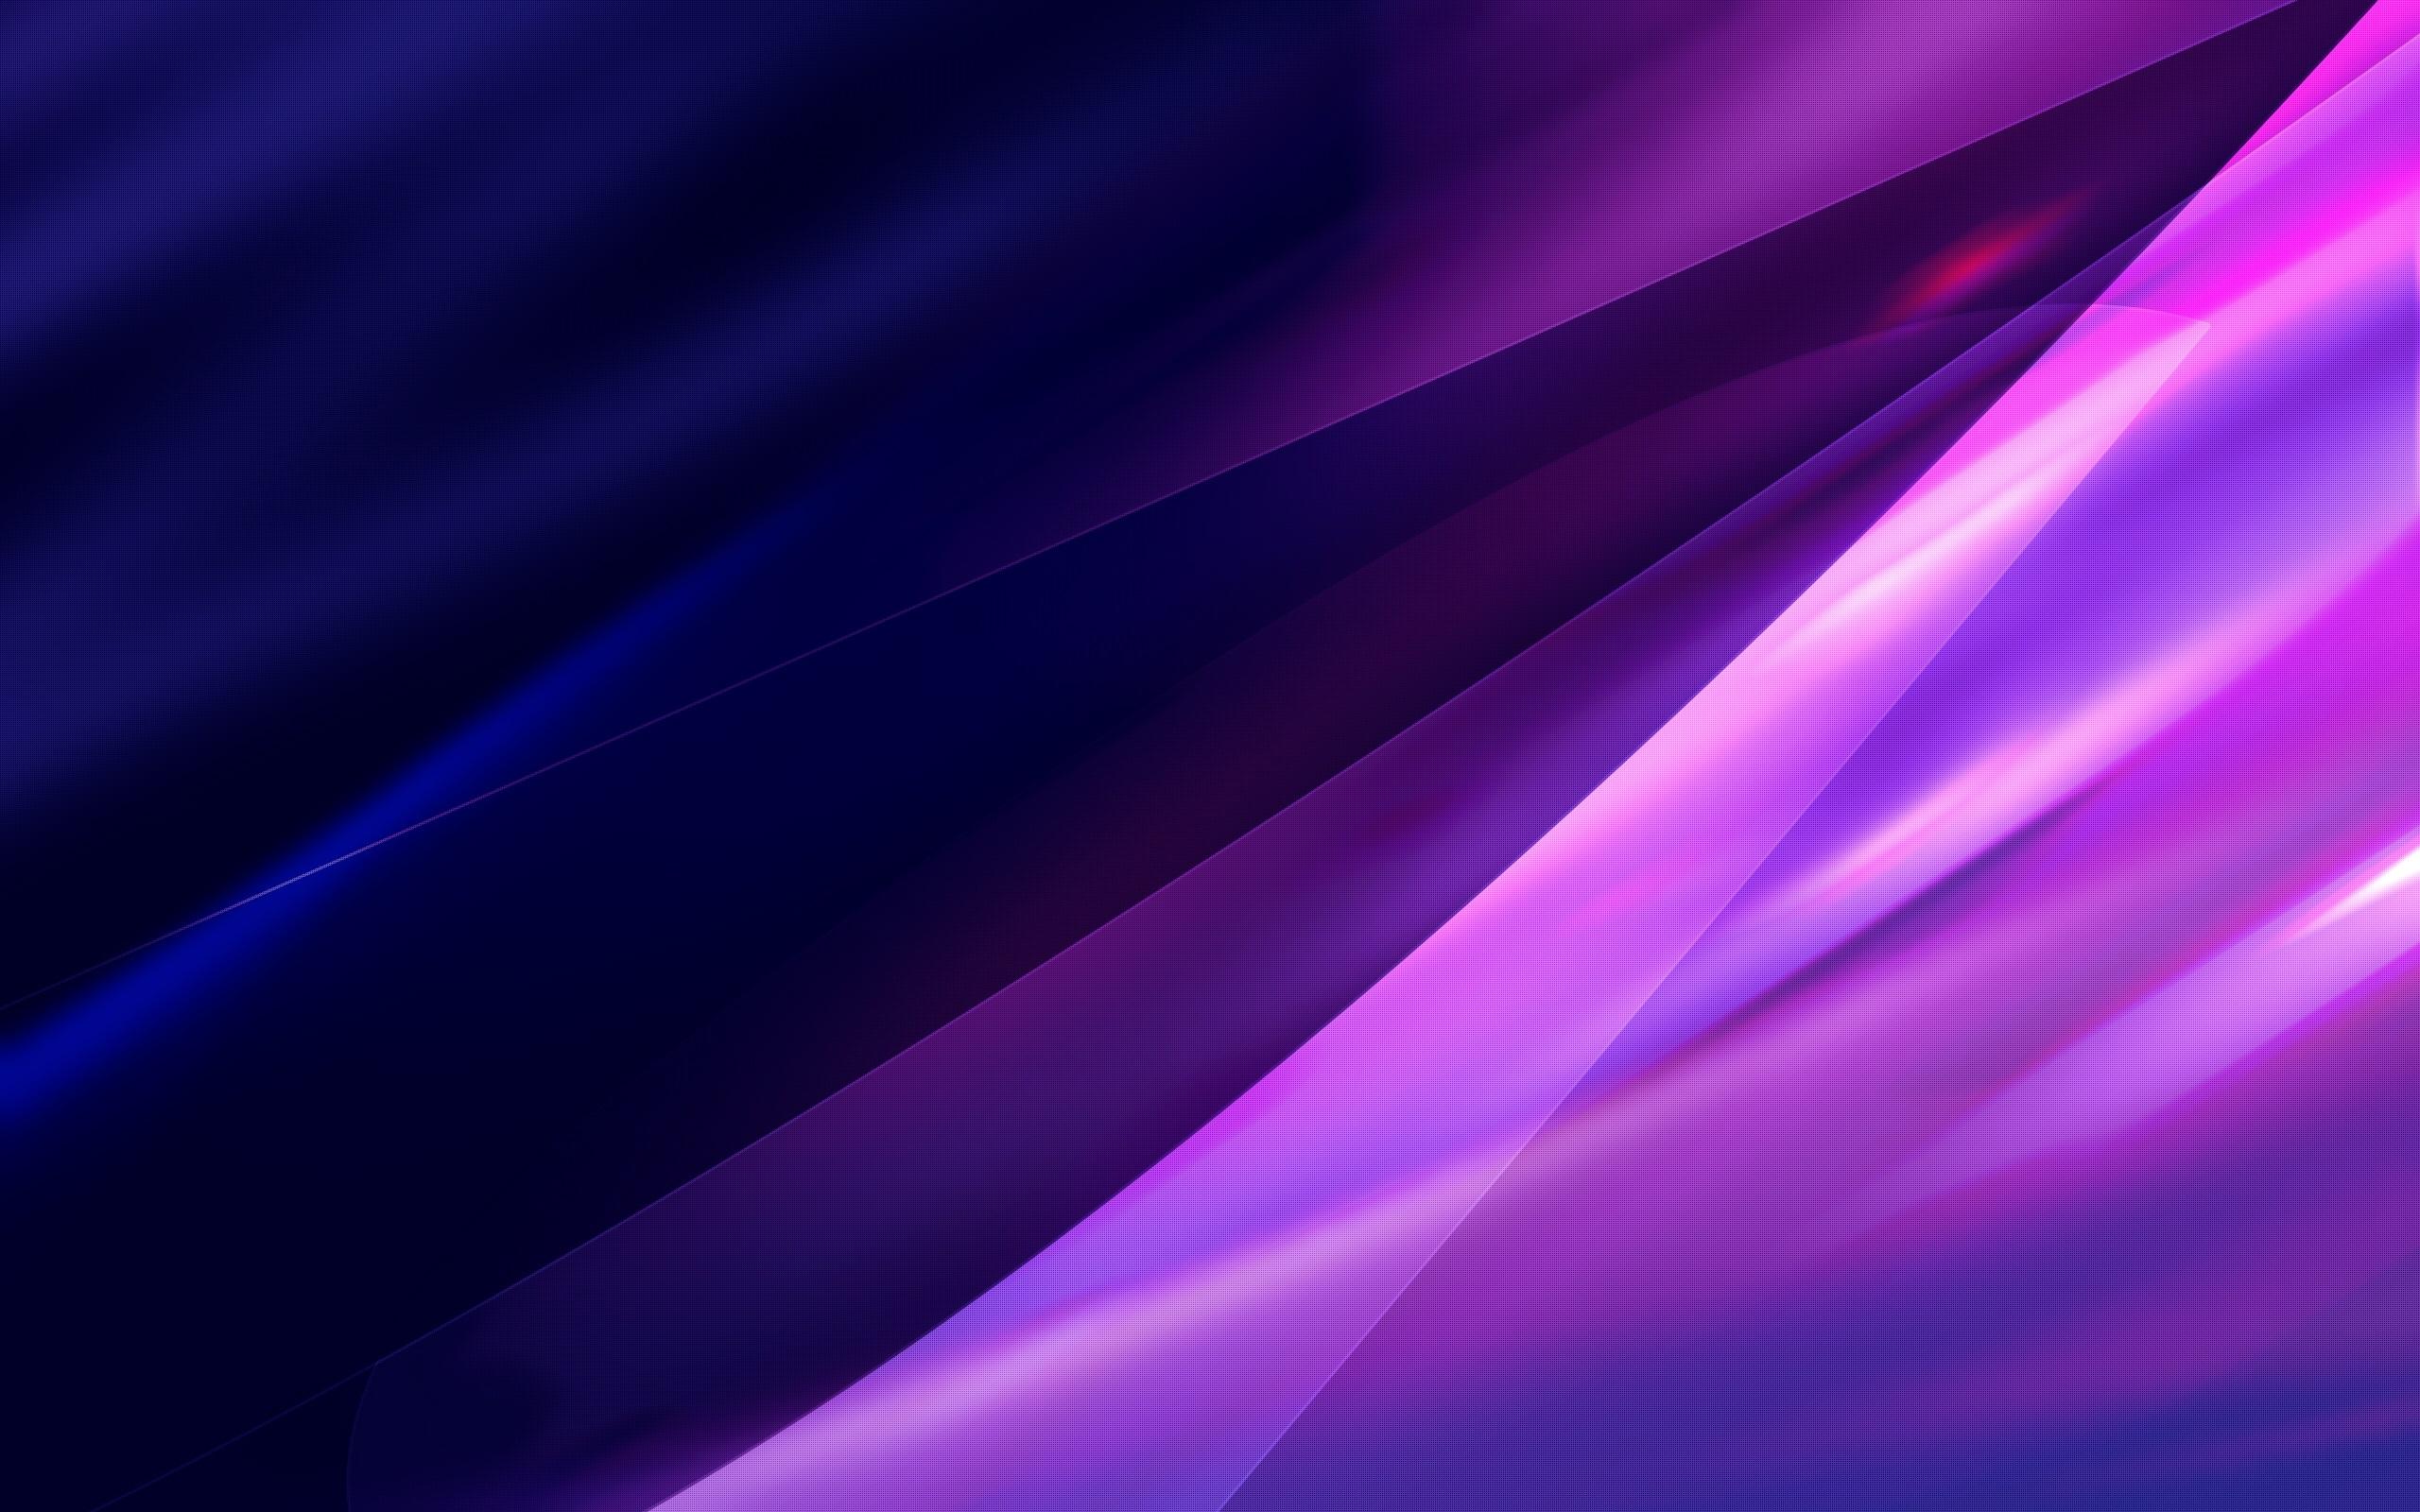 Light Purple Background Hd: Wallpaper Purple Abstract Background, Light 2560x1600 HD